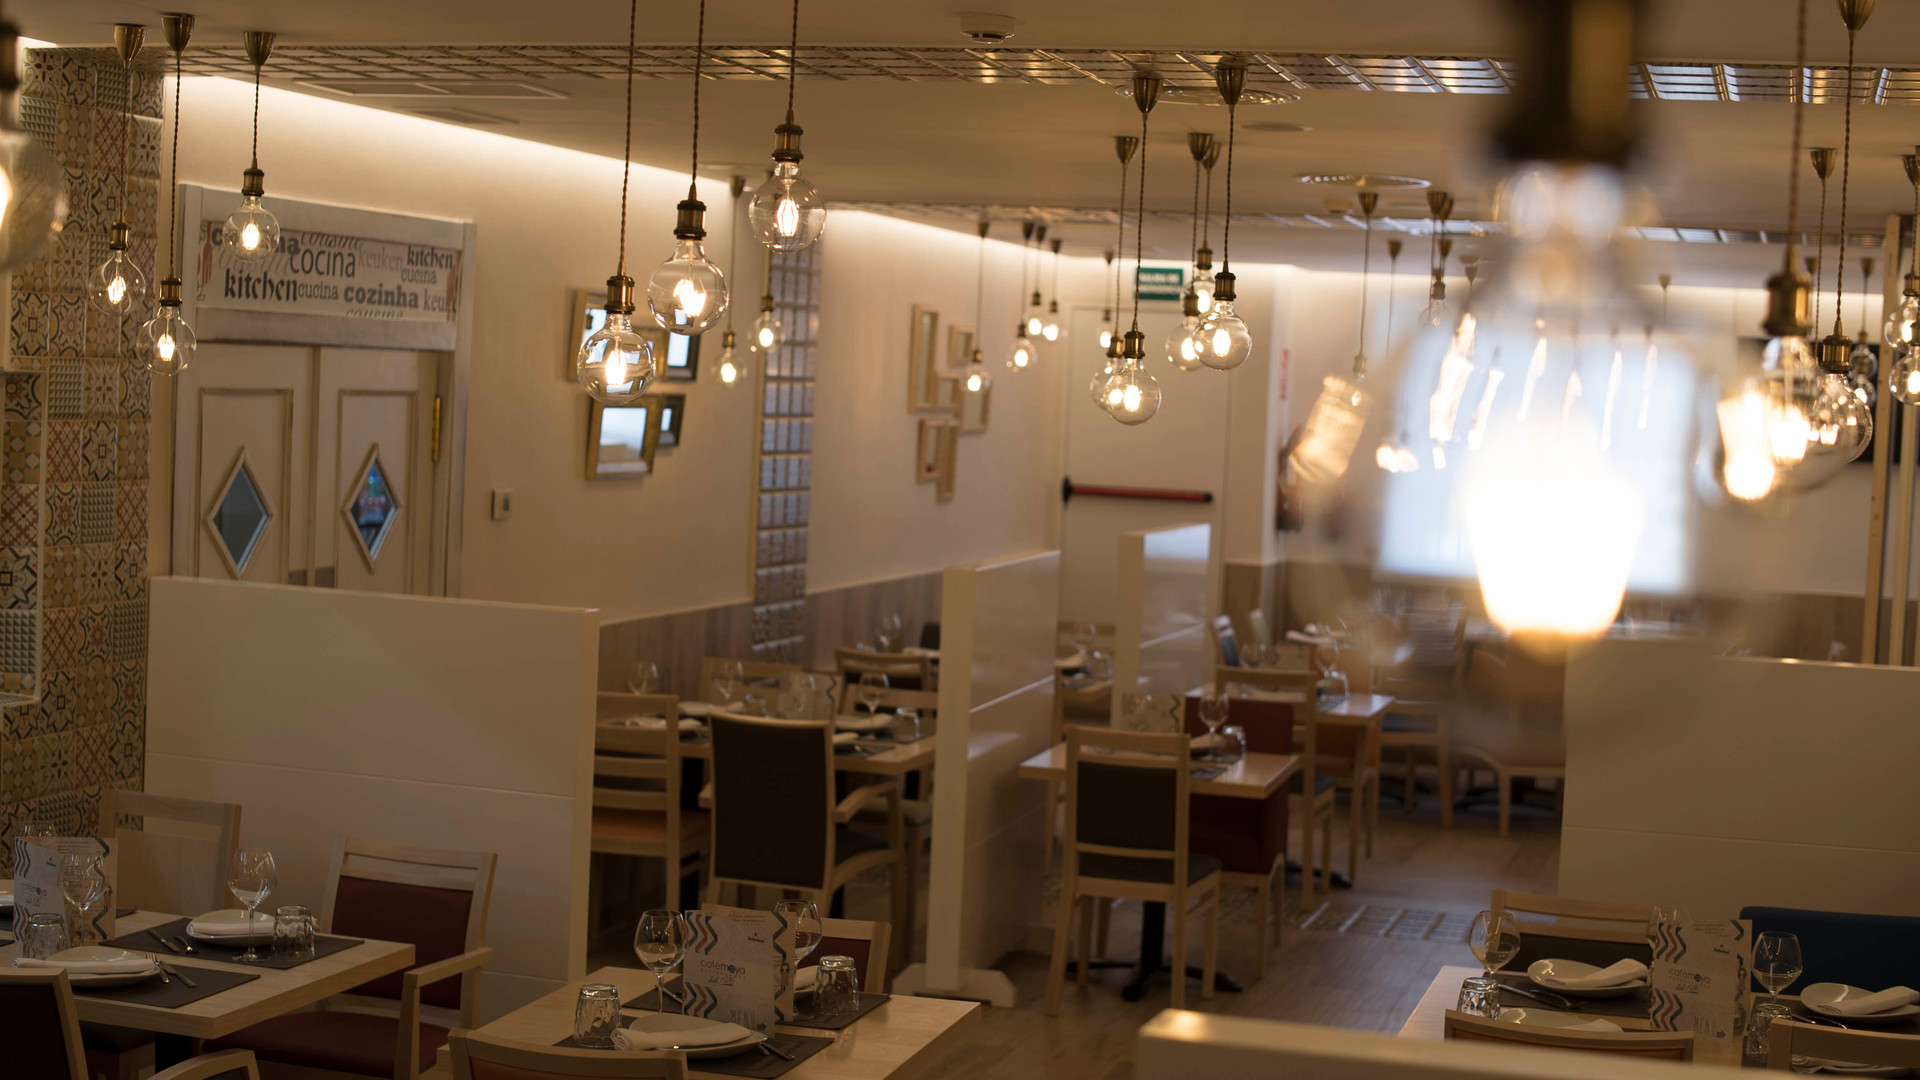 ARETIA-REFORMA CAFE MOYA (30).jpg